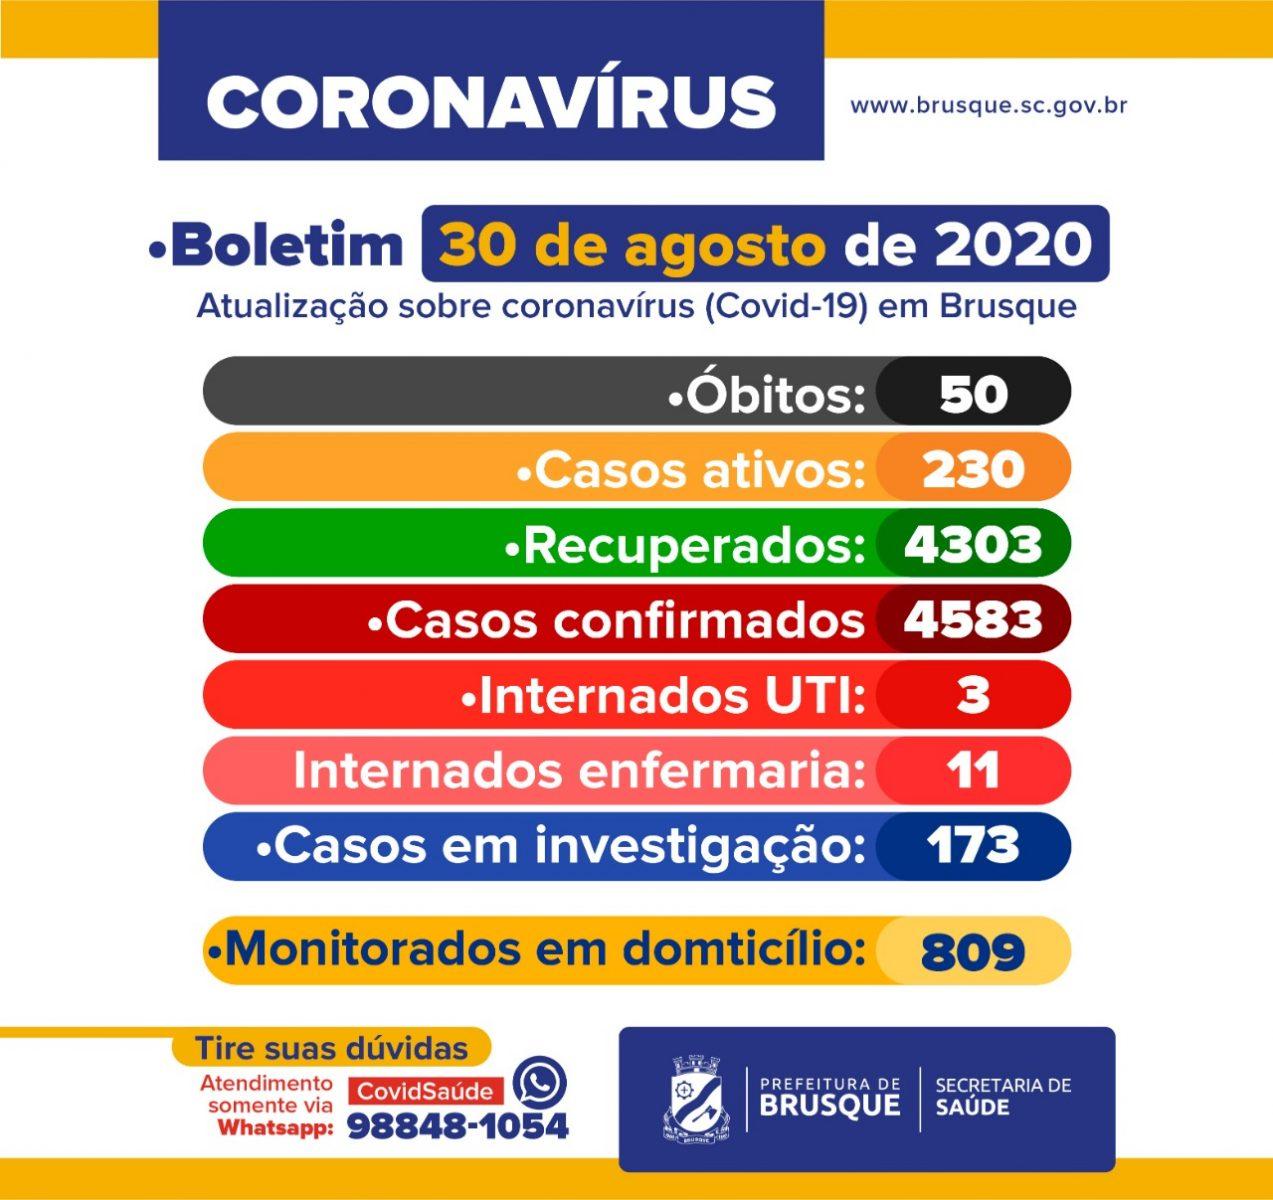 COVID-19: Boletim epidemiológico deste domingo (30) de agosto